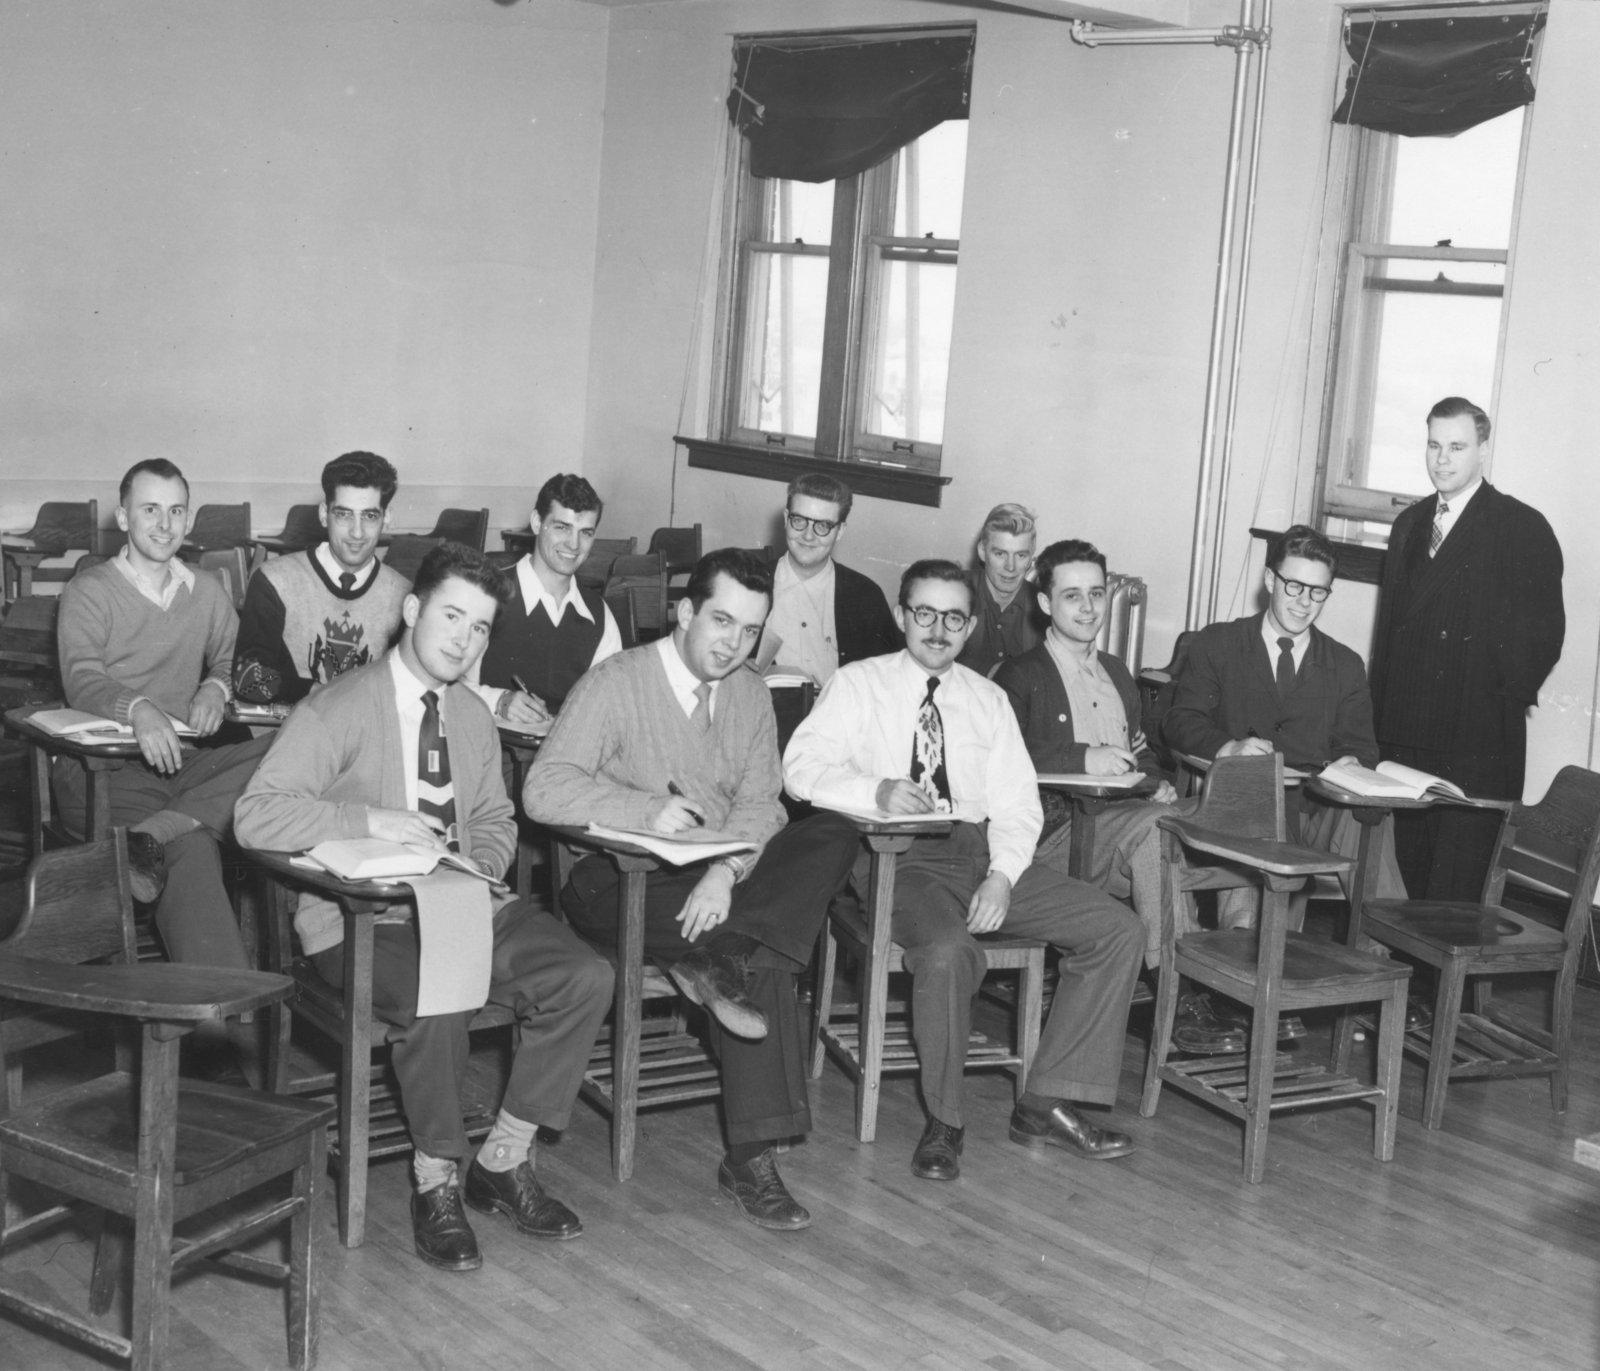 Herman Overgaard with economics students at Waterloo College, 1948-1949